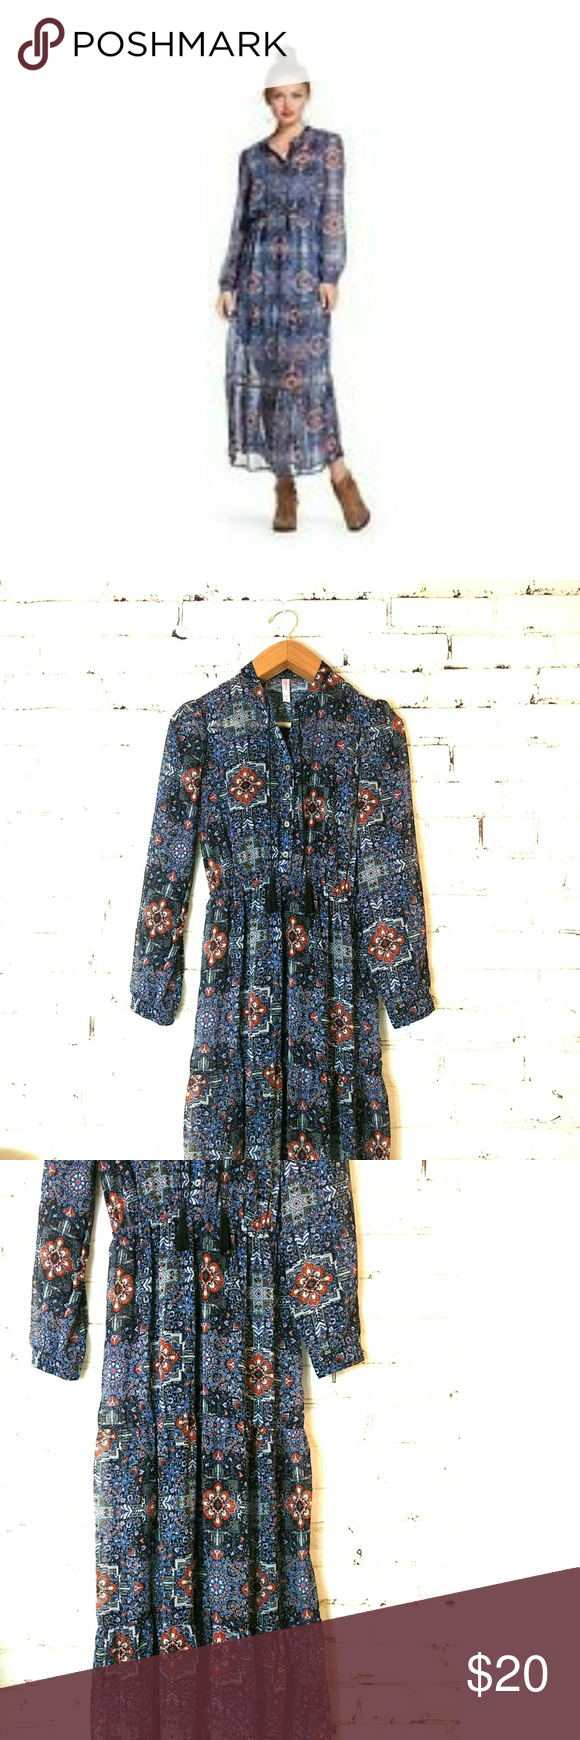 4 20 Xhilaration Maxi Dress Maxi Dress With Sleeves Long Sleeve Maxi Dress Dresses [ 1740 x 580 Pixel ]